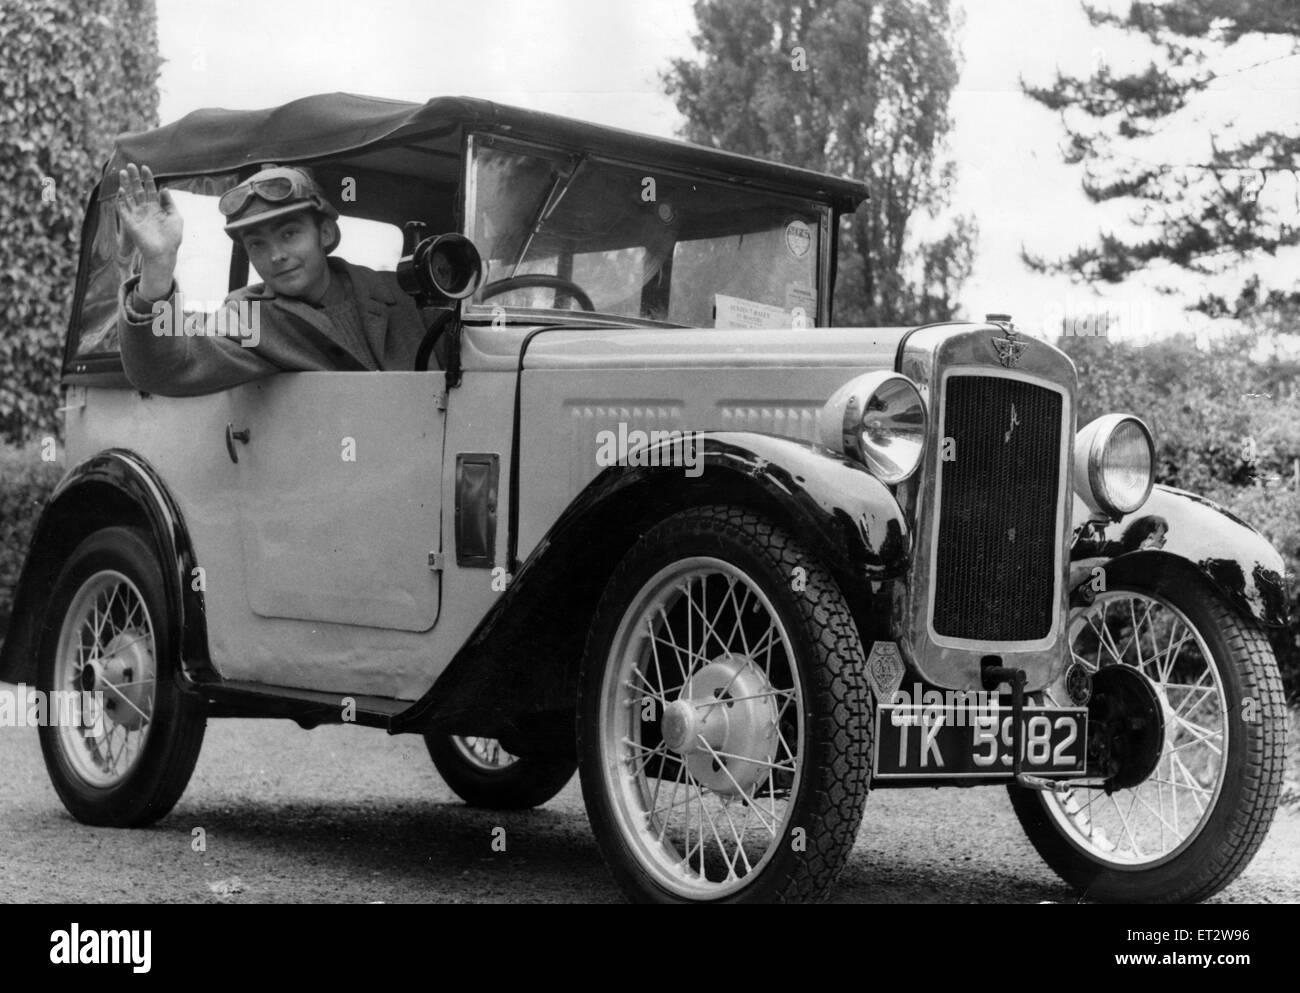 1930 Austin sette 'Chummy', di proprietà di Adrian Humphreys di Middlesbrough, 28 giugno 1967. Immagini Stock